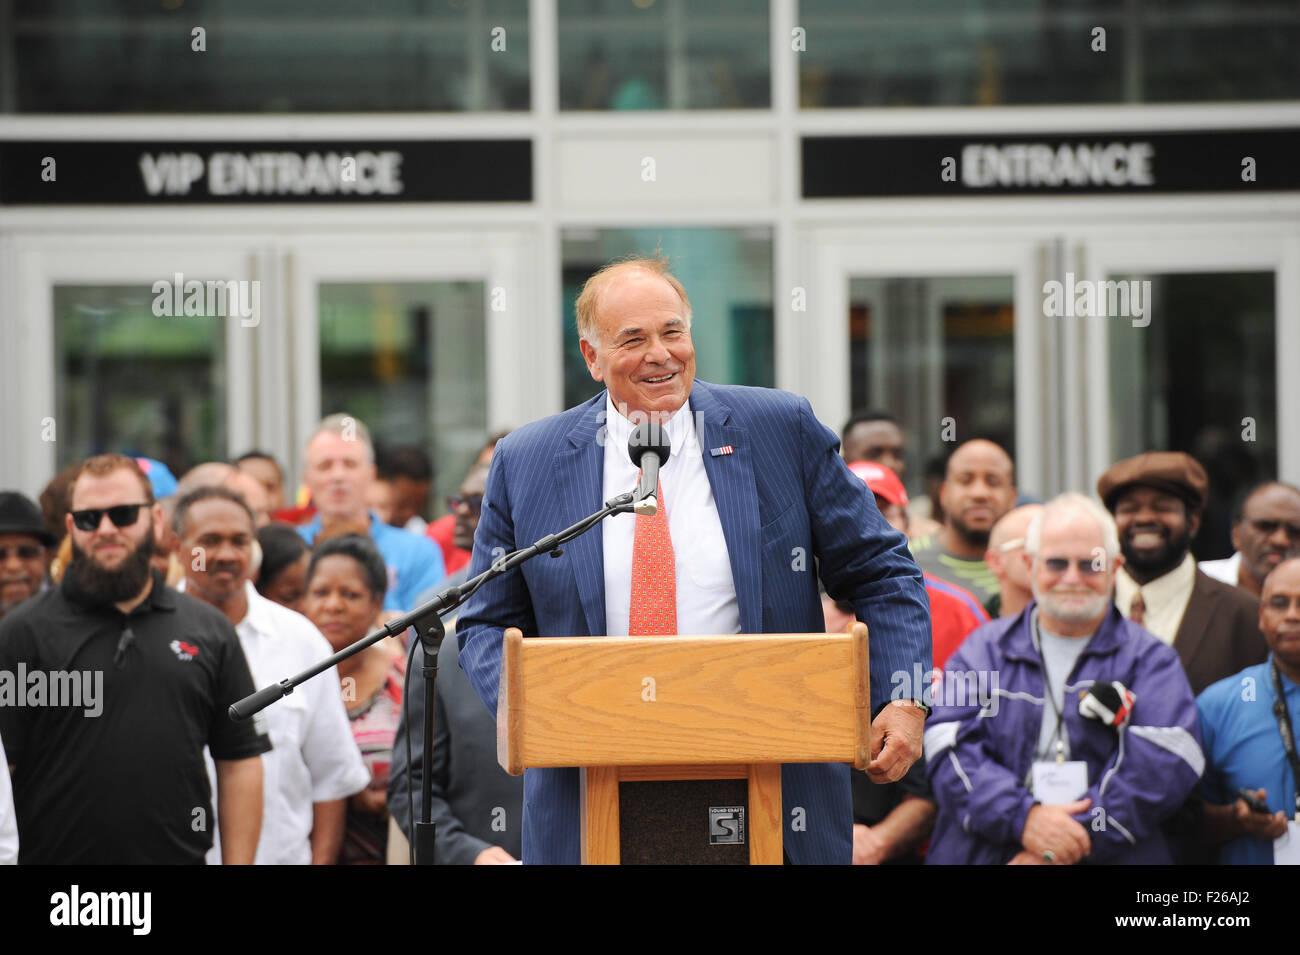 Philadelphia, Pennsylvania, USA. 12th Sep, 2015. Former Pennsylvania Governor, ED RENDELL, speaking at the unveiling - Stock Image